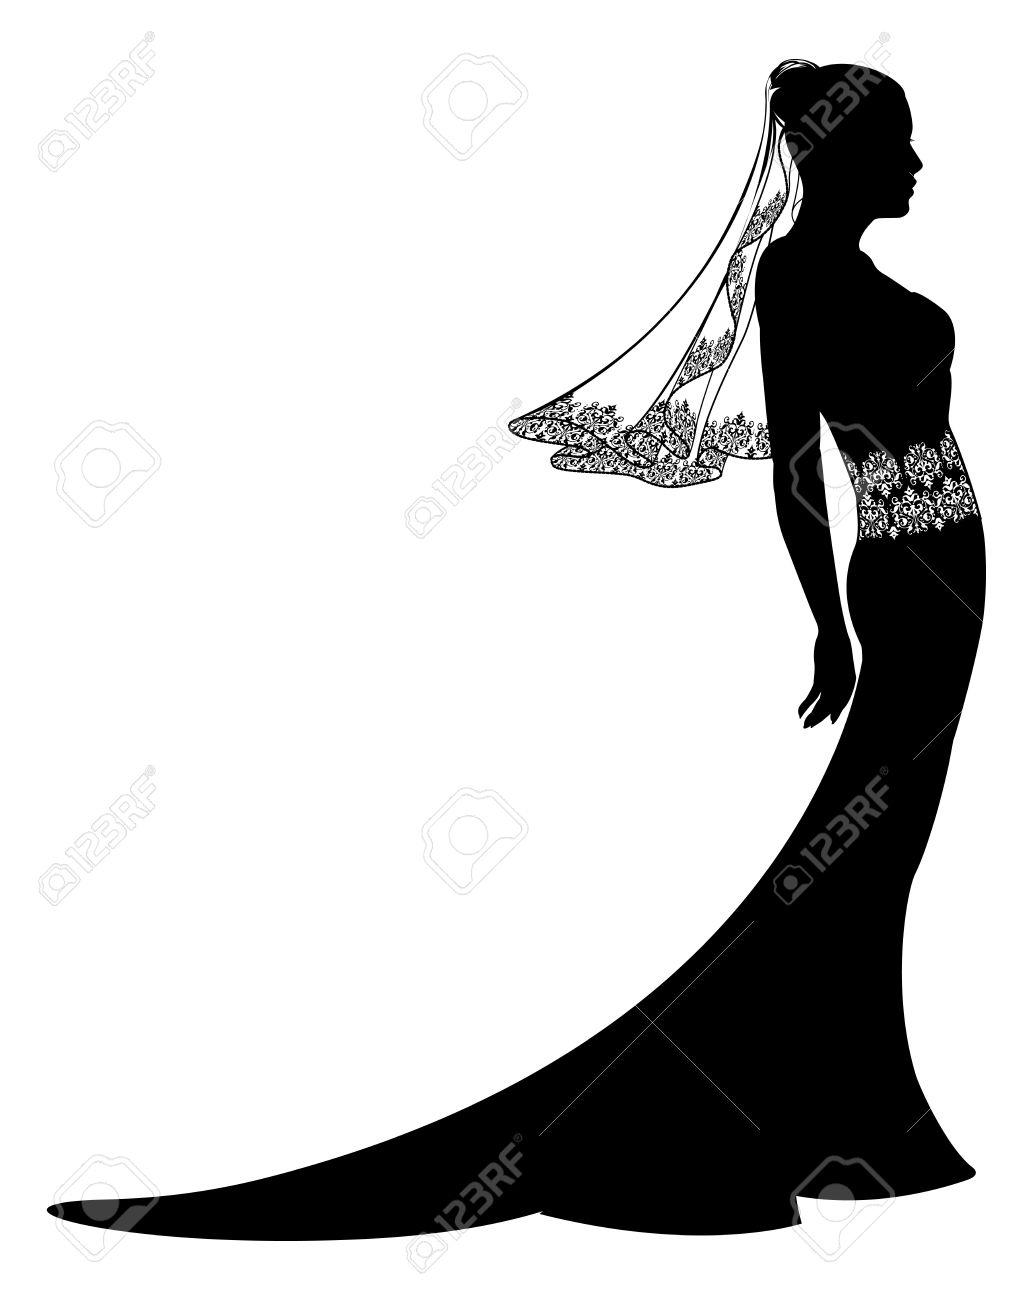 1033x1300 Stylish Wedding Dress Silhouette